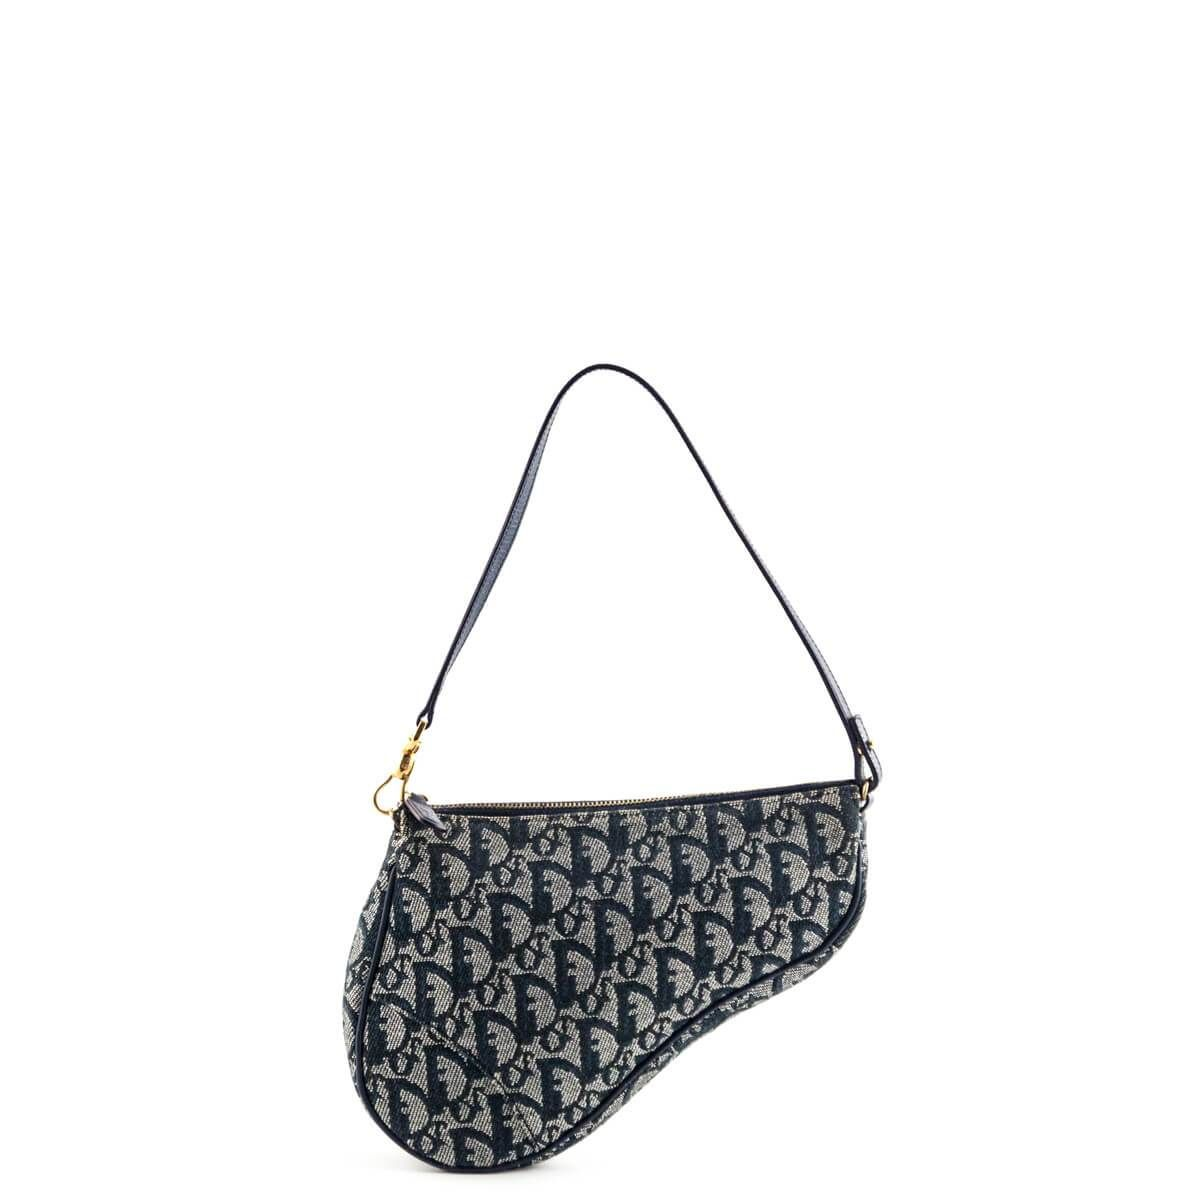 Dior Book Tote Orange Black Animals Embroidered Canvas Bag M1286 In 2020 Vintage Designer Bags Bags Designer Bags